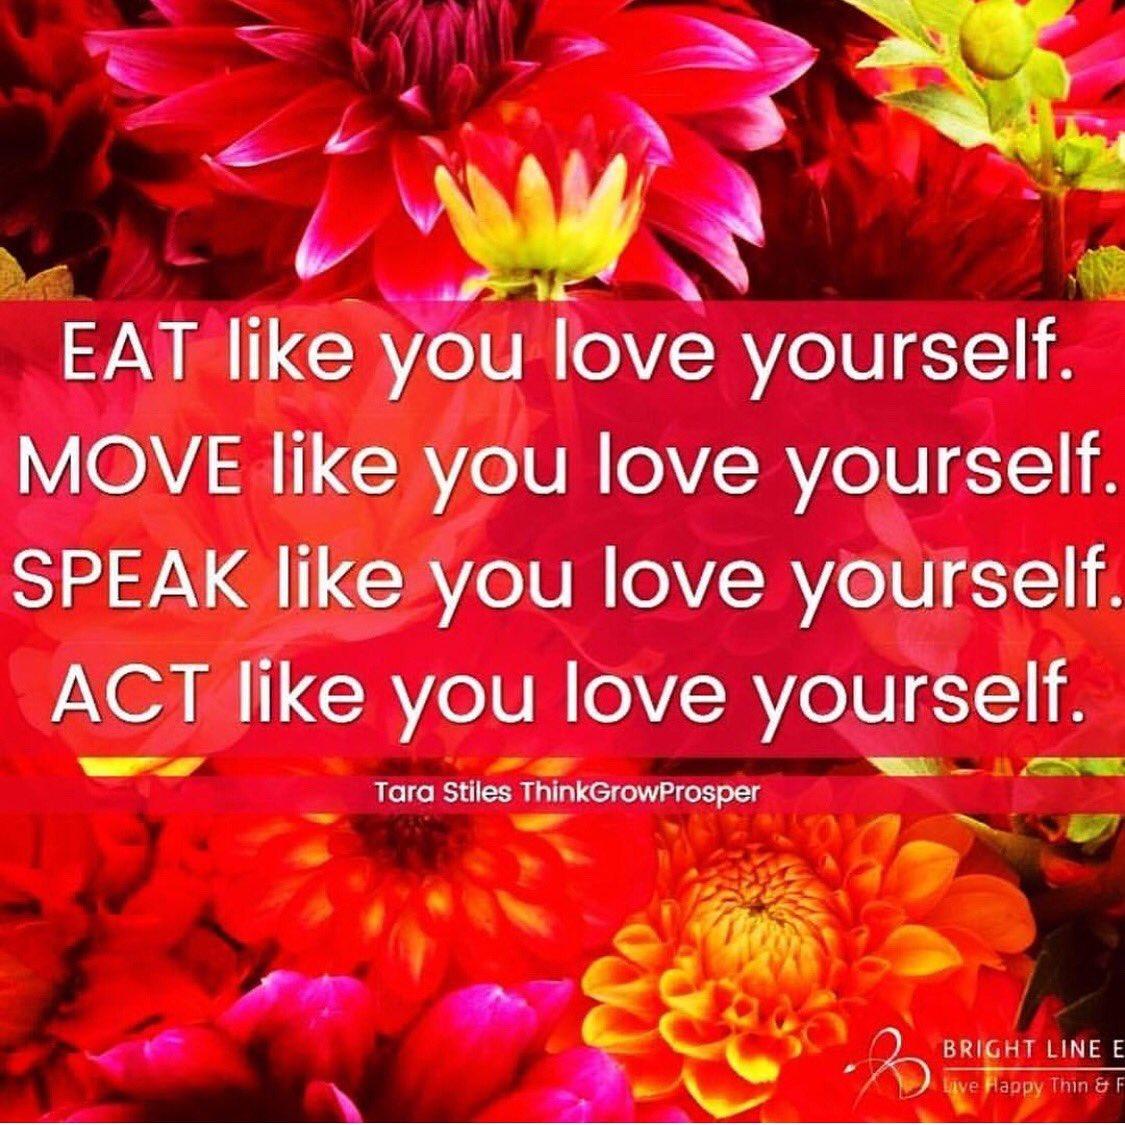 Susan Peircethompson On Twitter Eat Like You Love Yourself Move